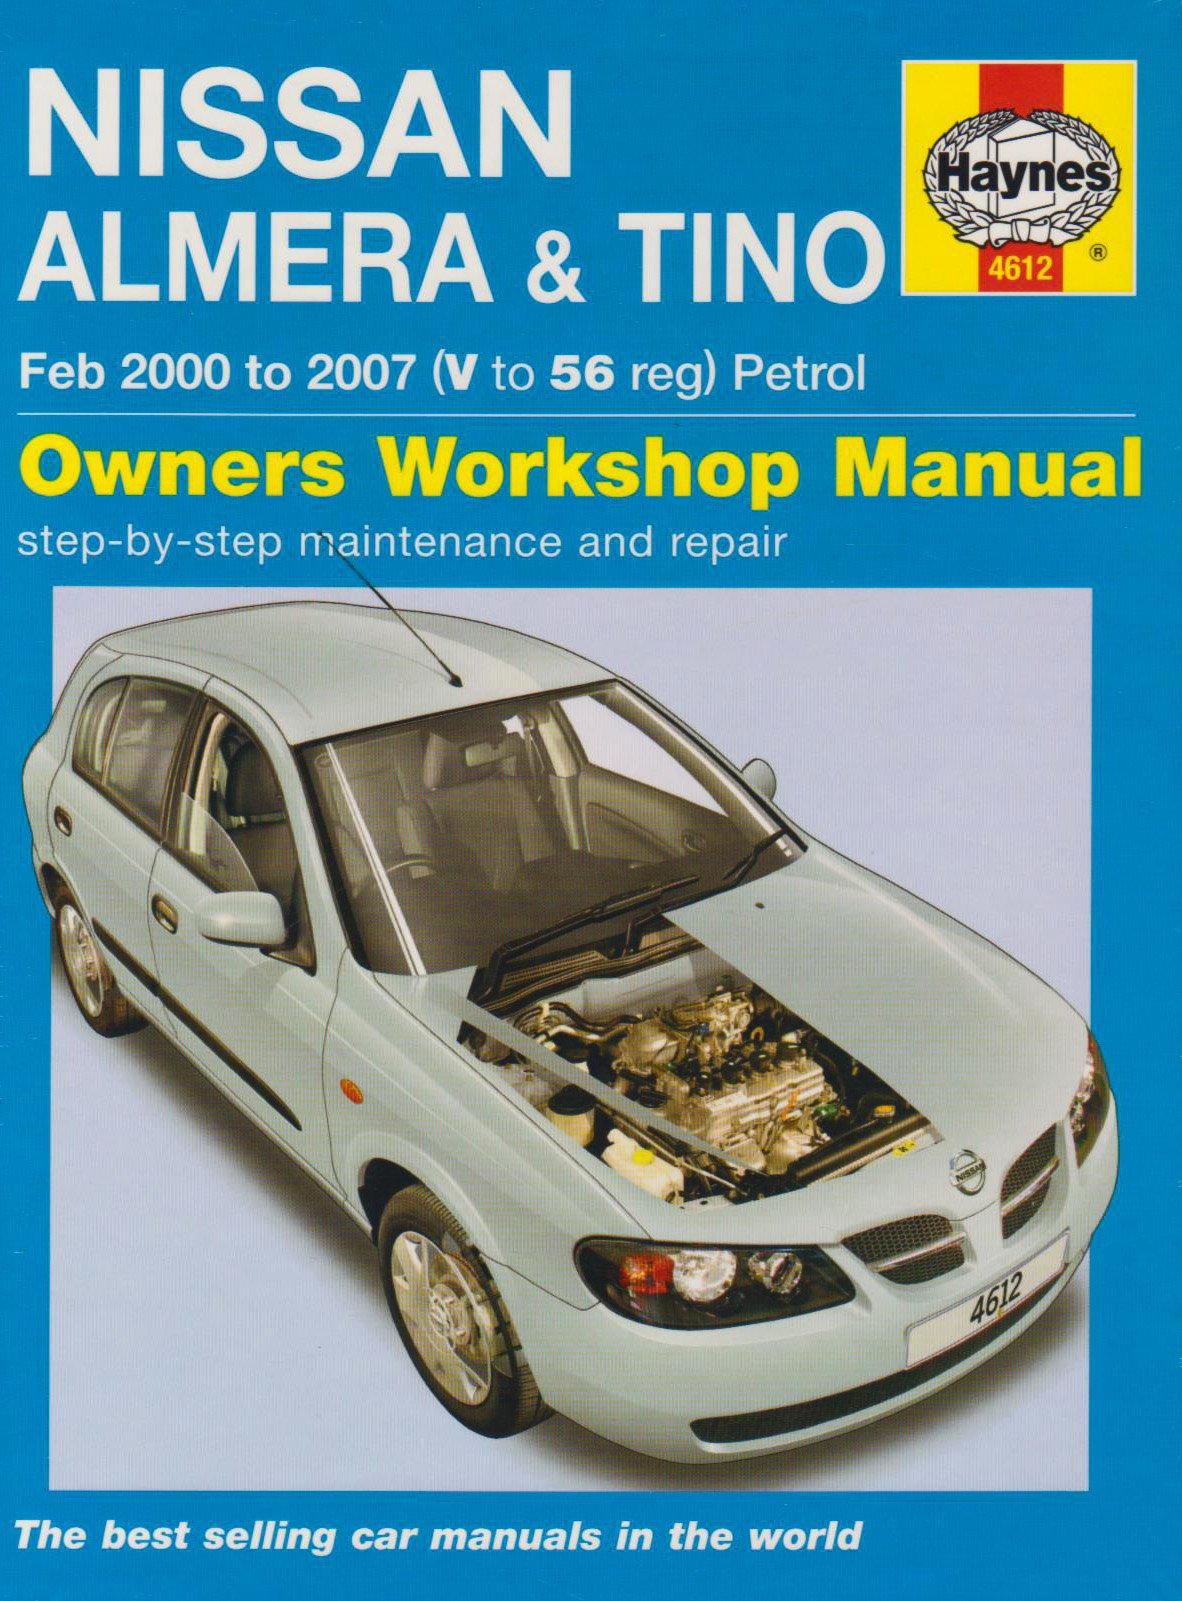 nissan almera and tino petrol service and repair manual haynes rh amazon co uk haynes manual nissan almera tino haynes manual nissan almera tino diesel